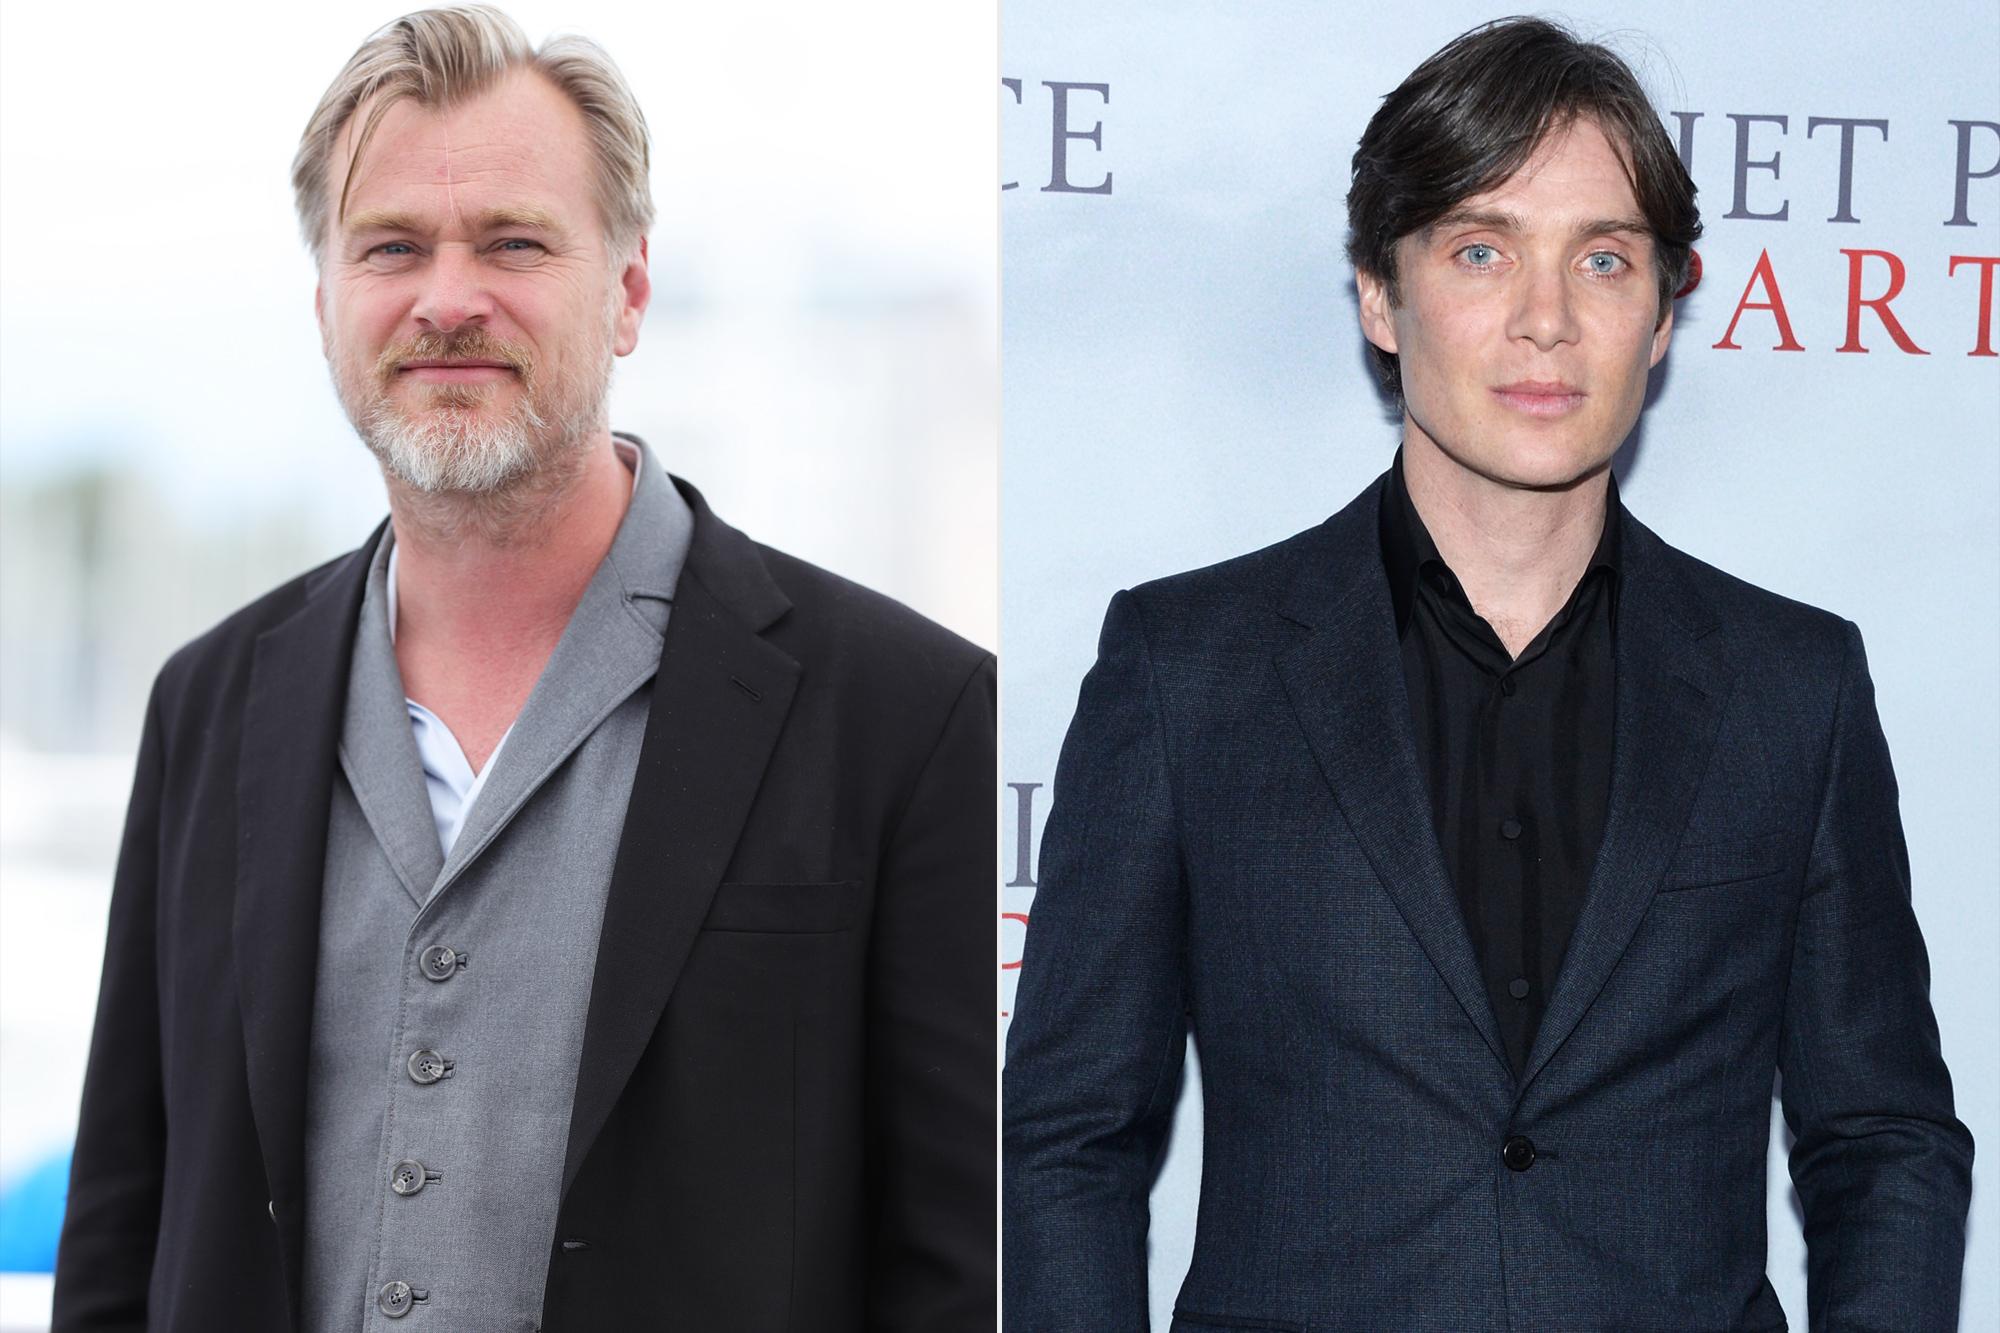 Christopher Nolan and Cillian Murphy